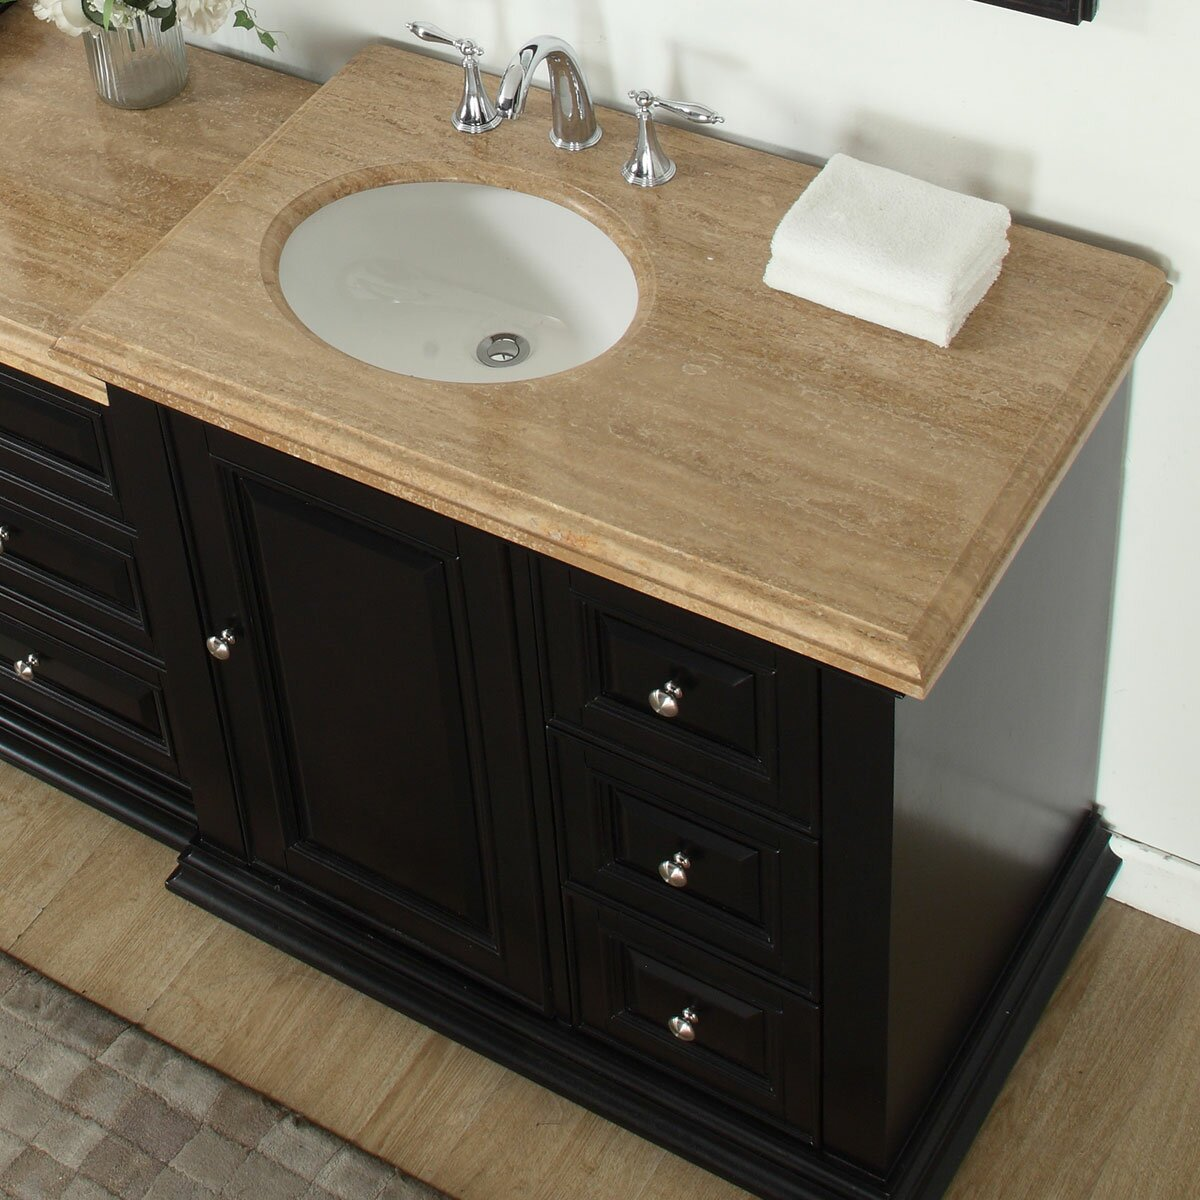 90 Bathroom Vanity Silkroad Exclusive 905 Double Sink Bathroom Modular Vanity Set